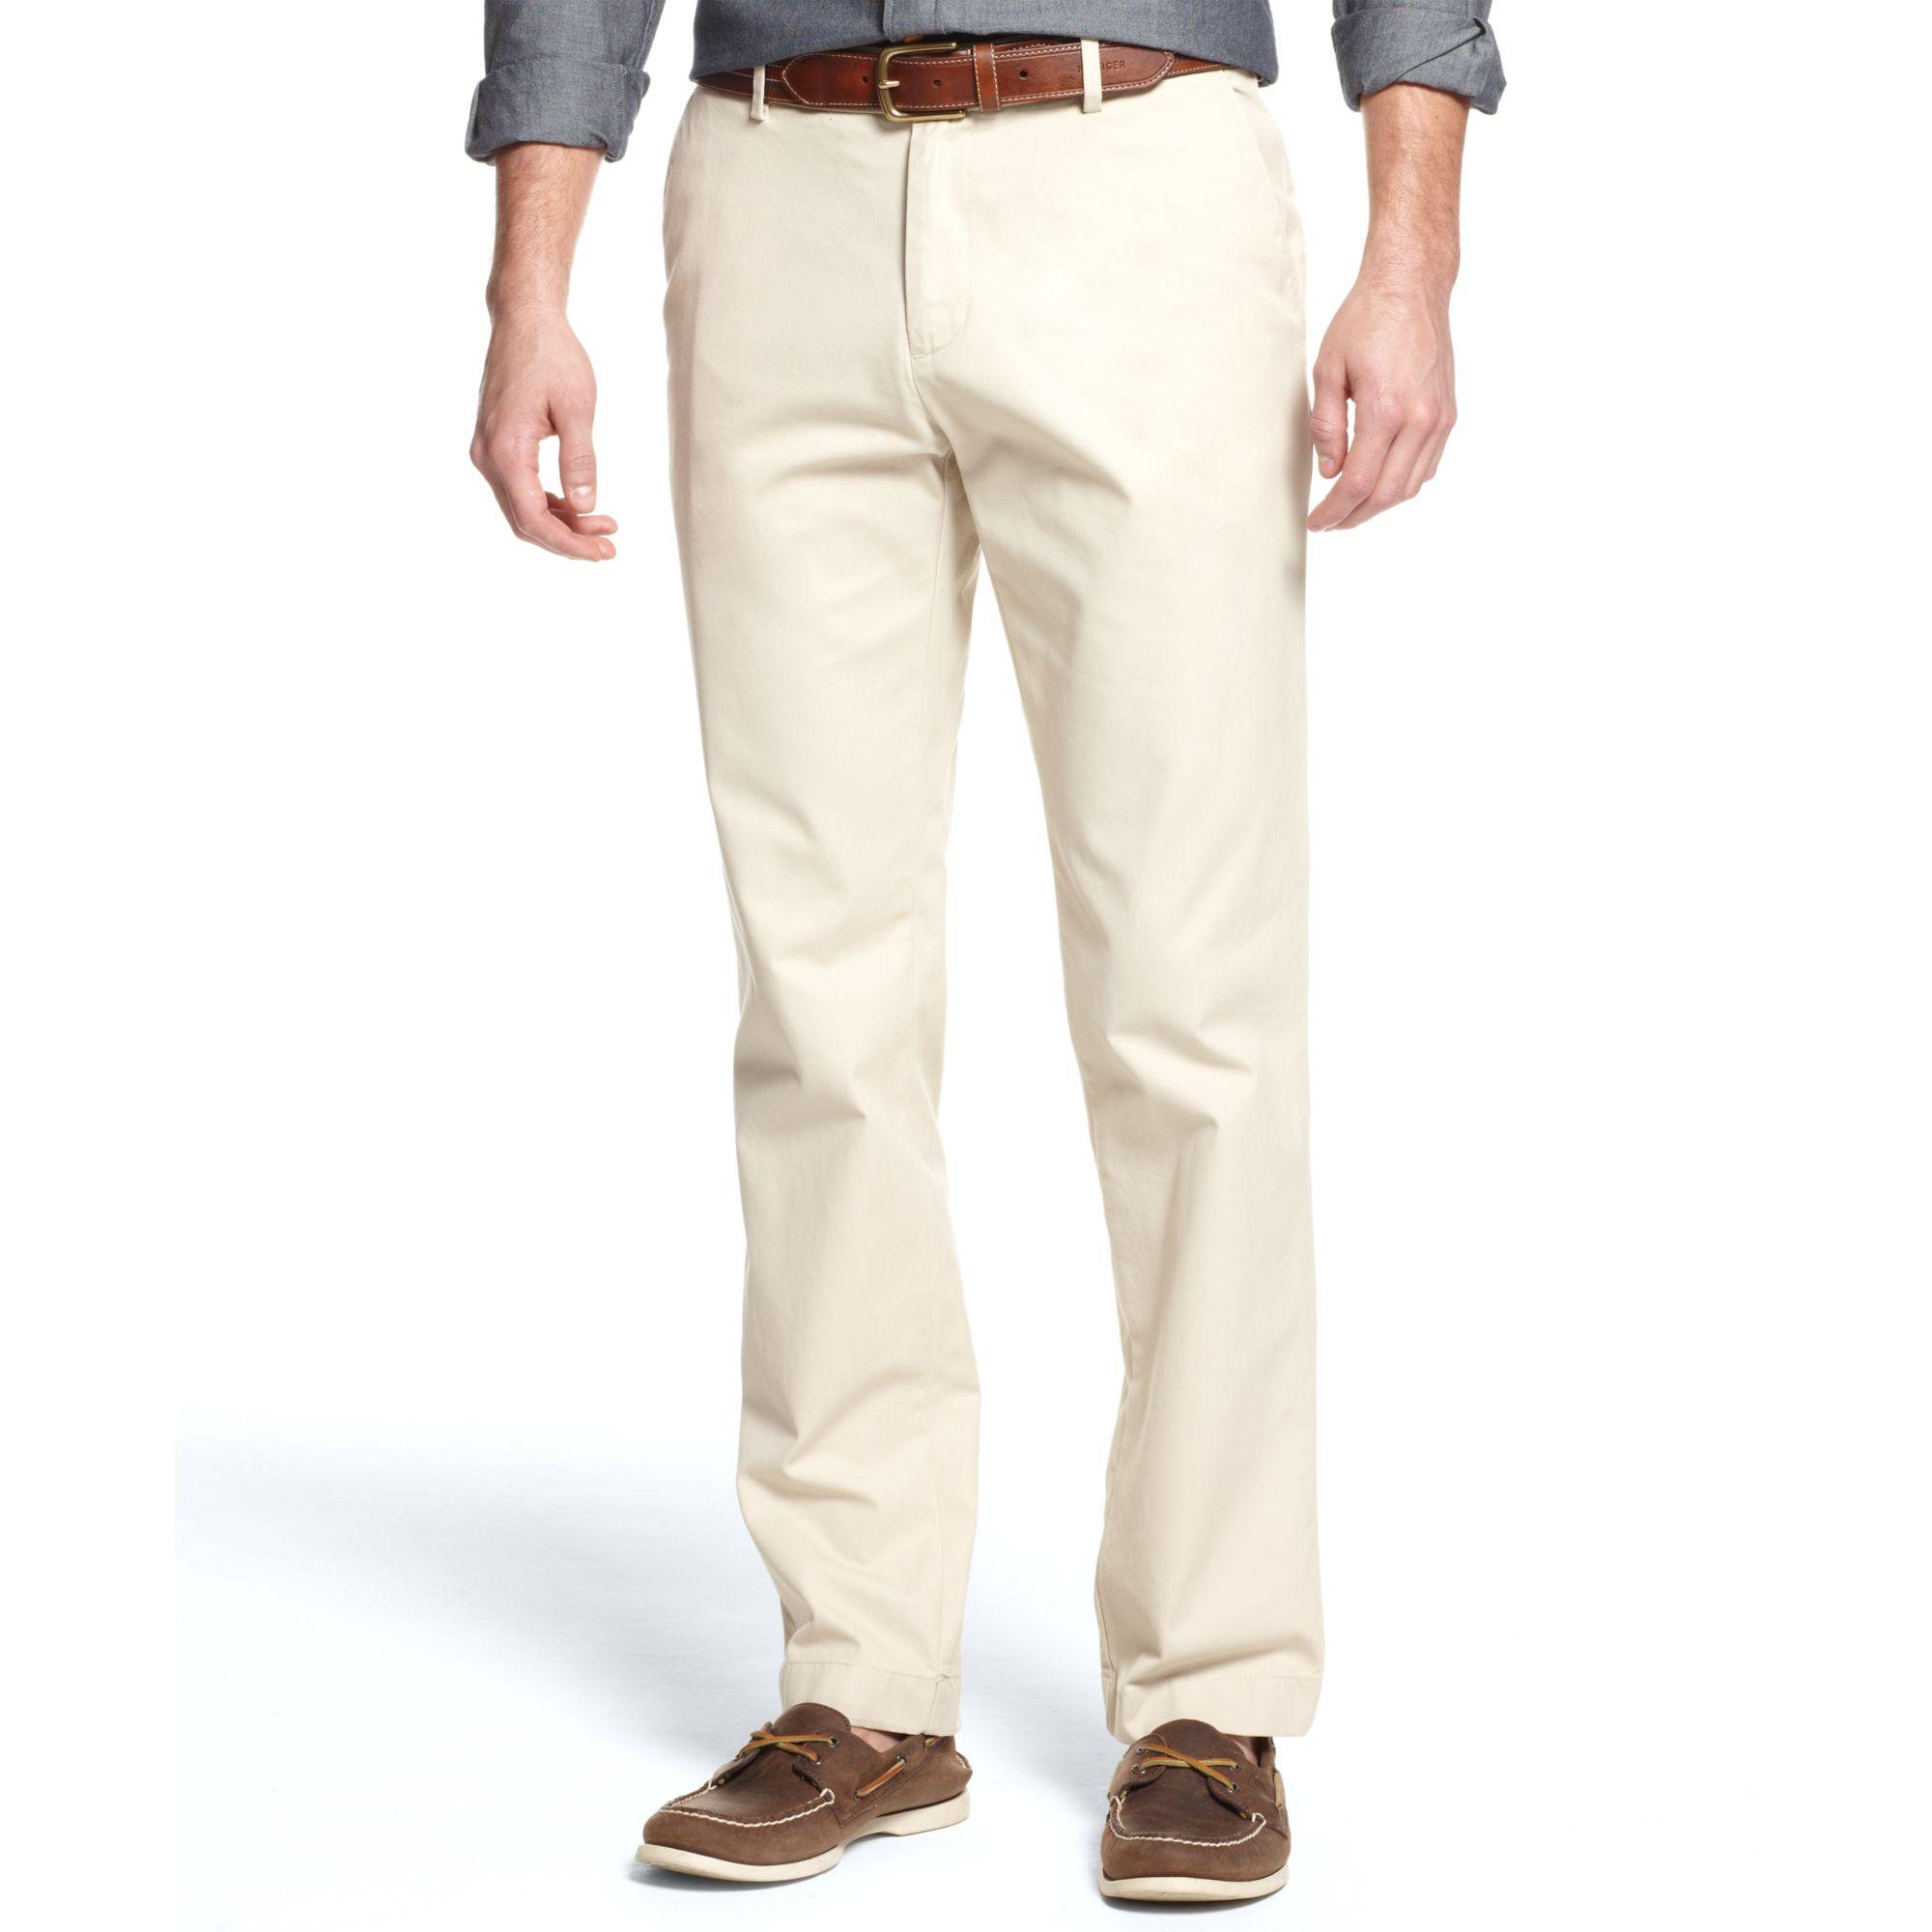 Dockers Mens Jeans